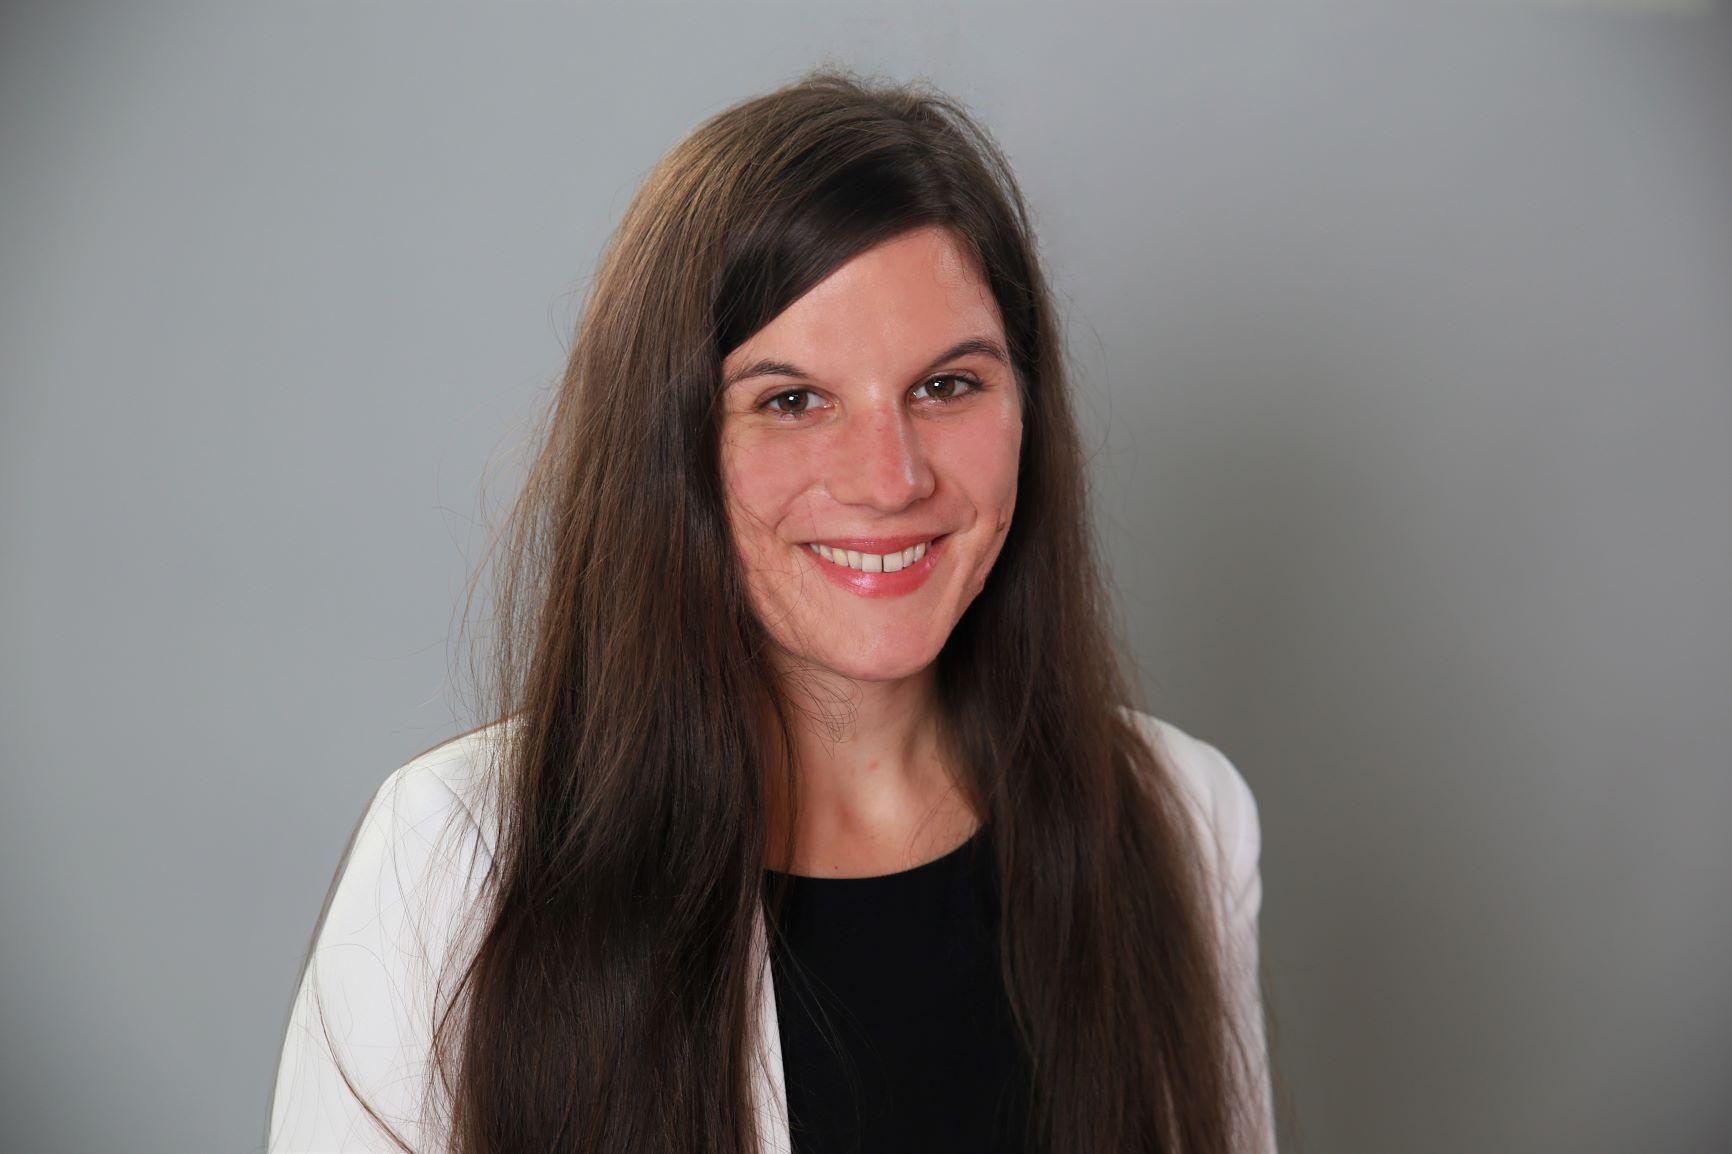 Denise Kirz